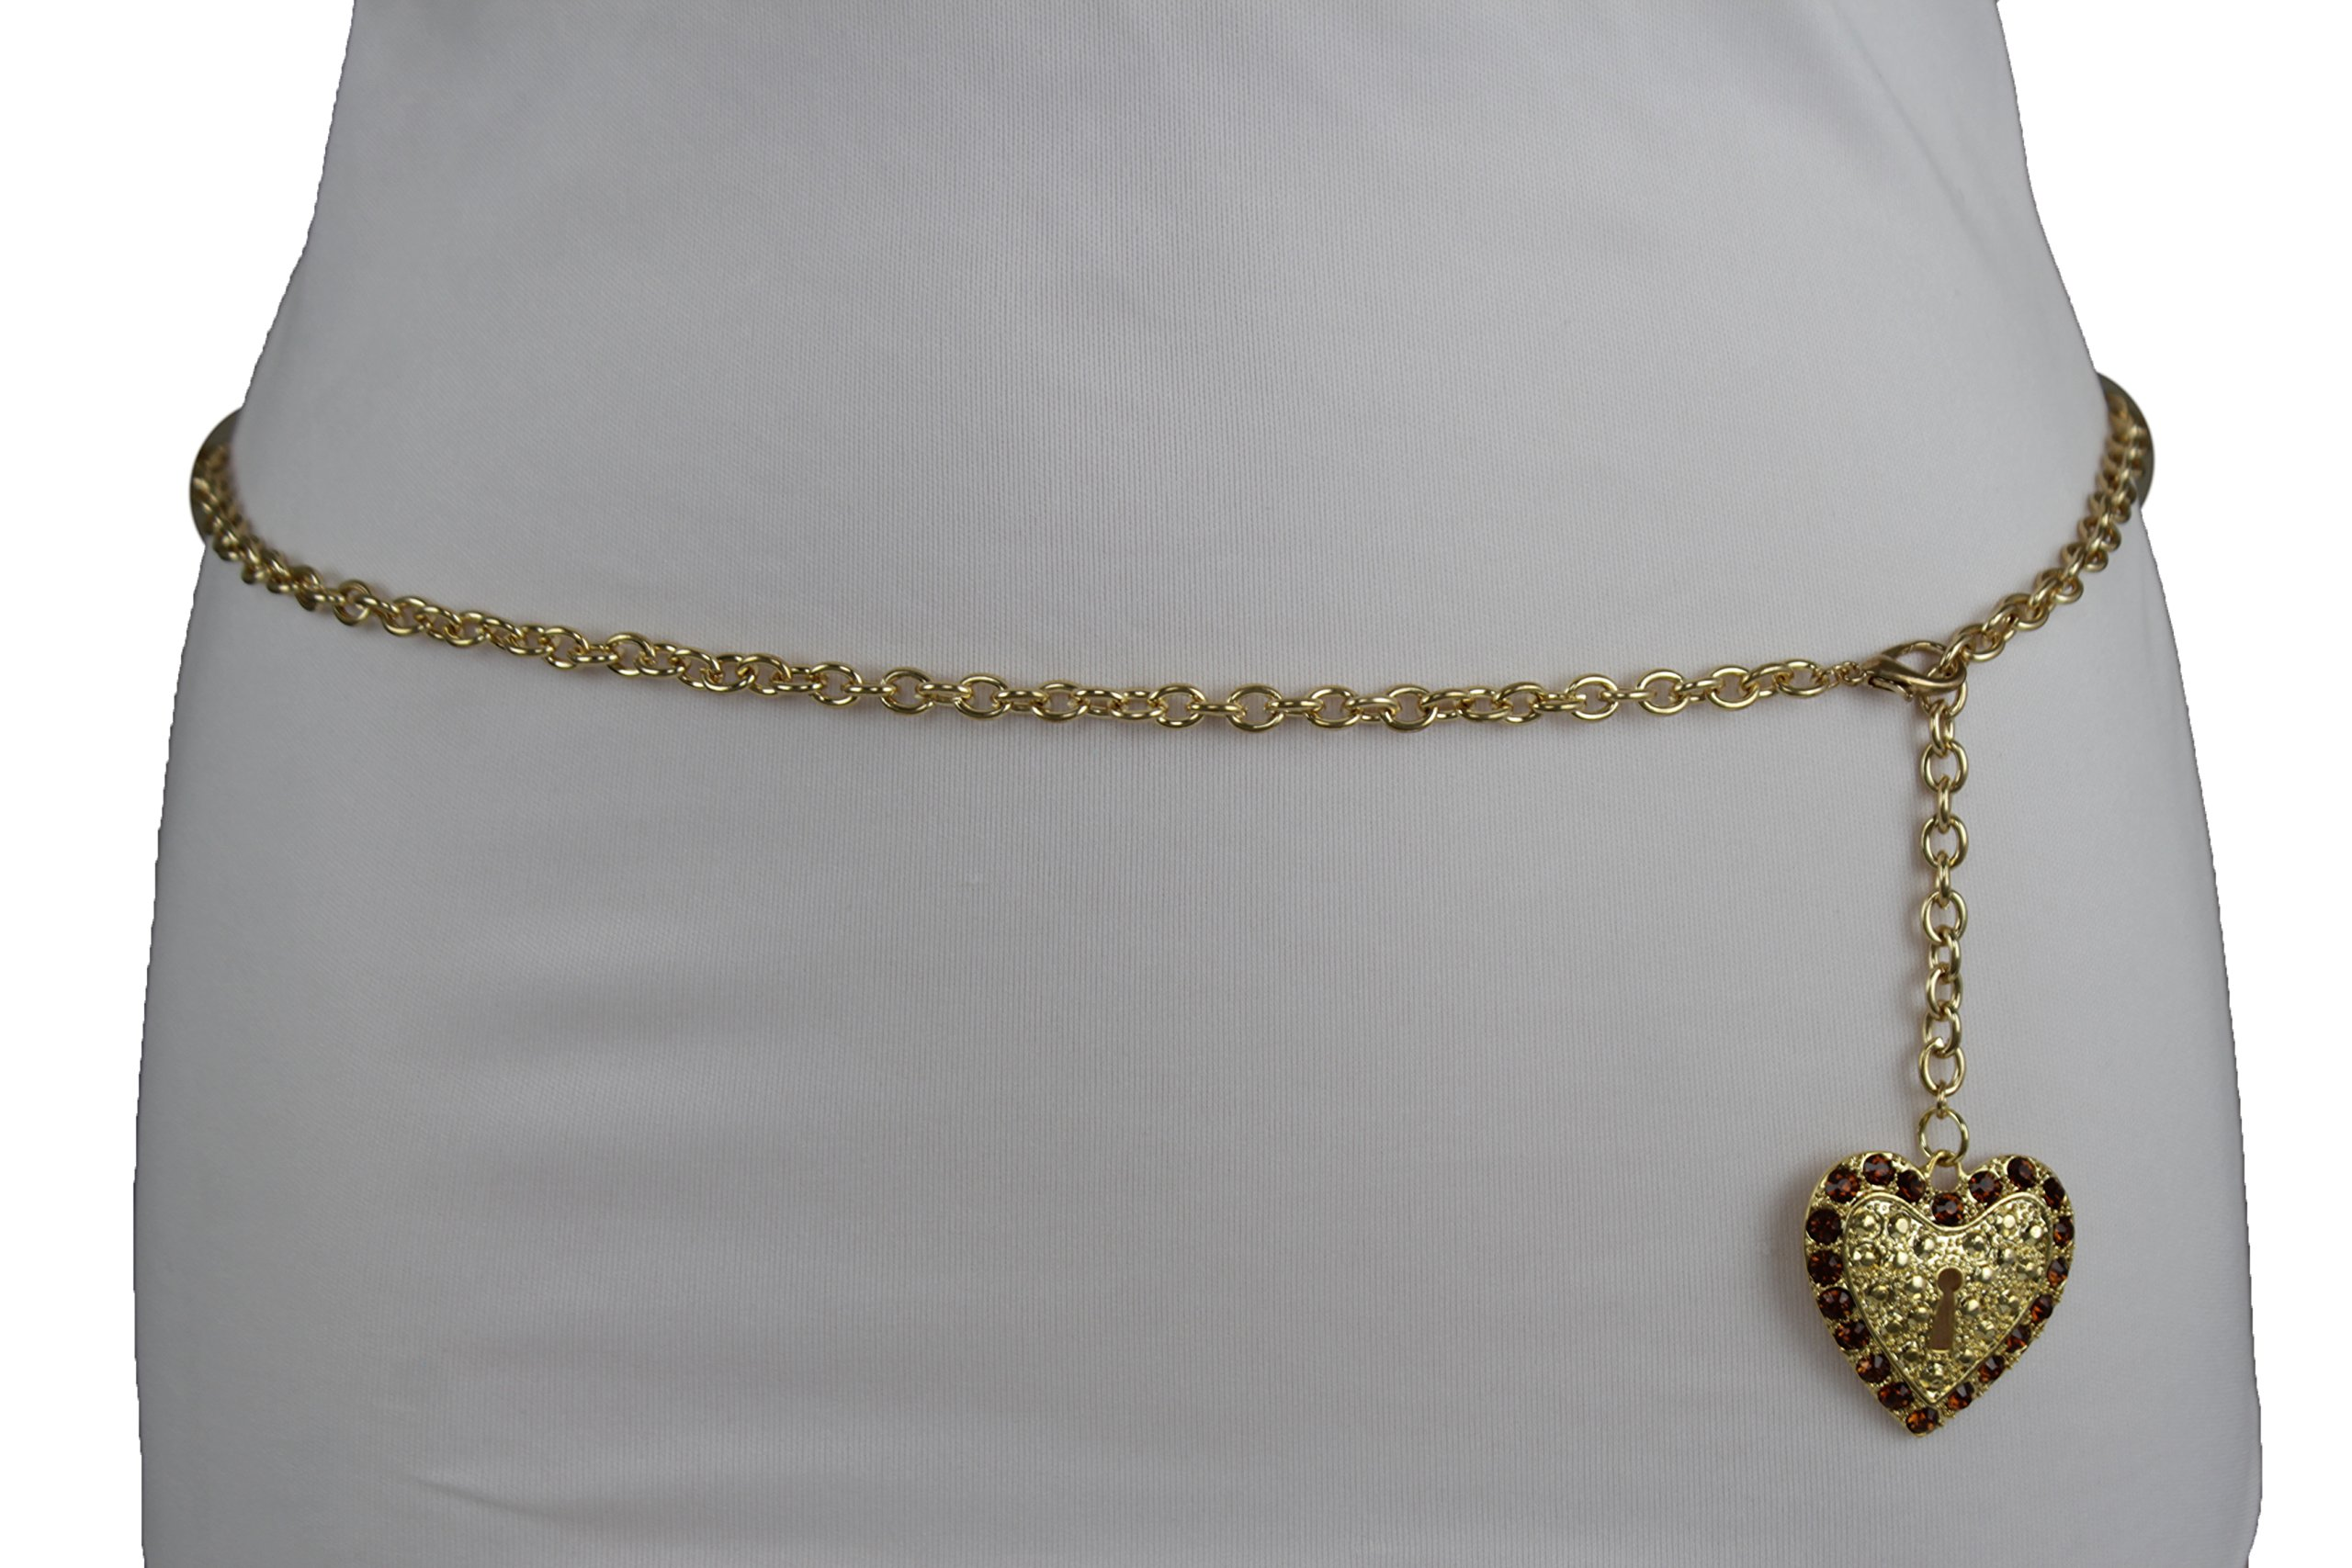 TFJ Women Fashion Narrow Belt Hip High Waist Gold Metal Chains Lock Love Key Heart Buckle (XS-Medium 20''-35'' waist)